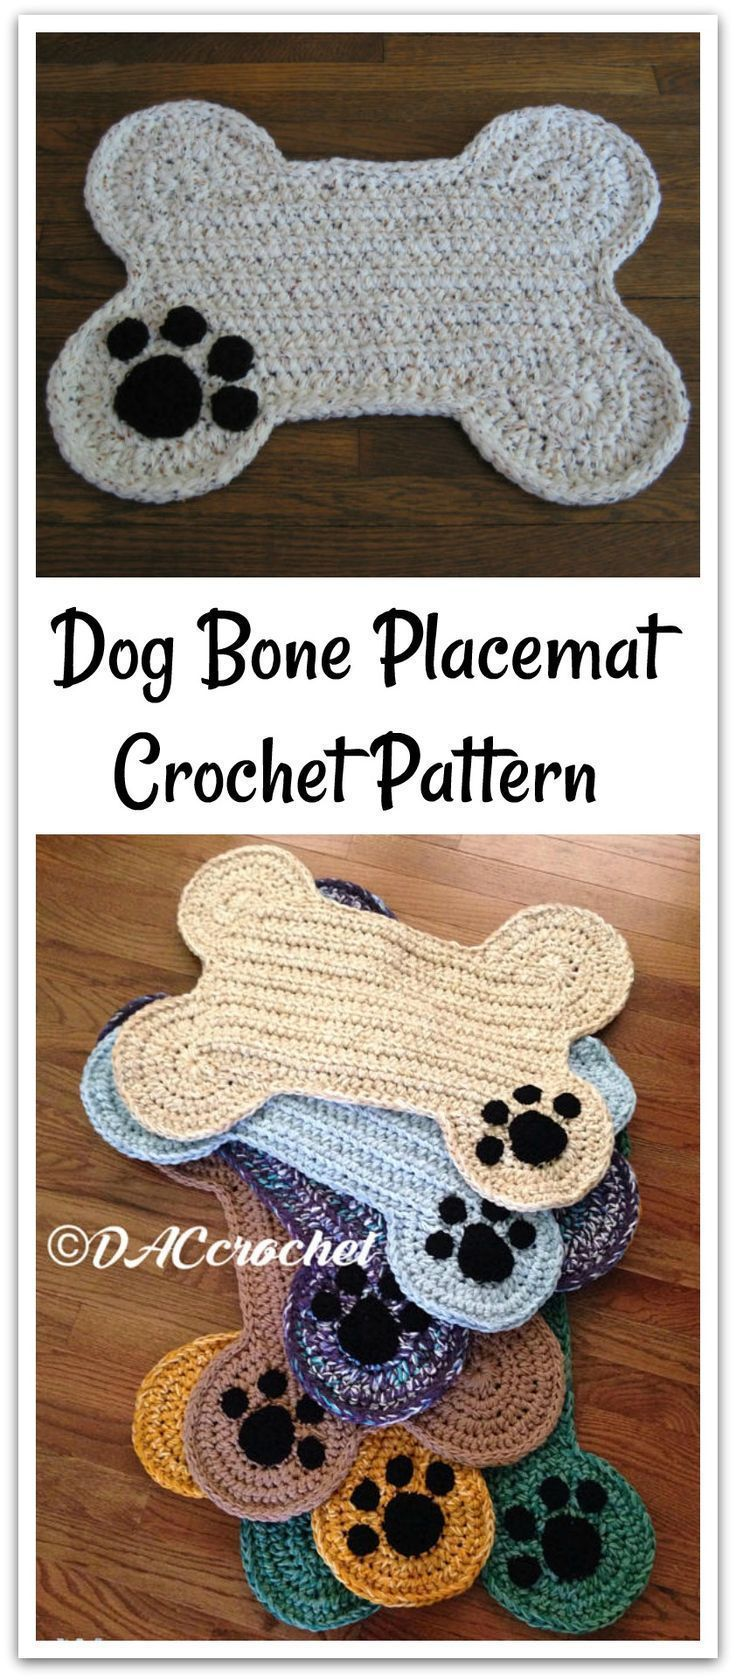 Crochet pattern only for a dog bone floor place mat 2